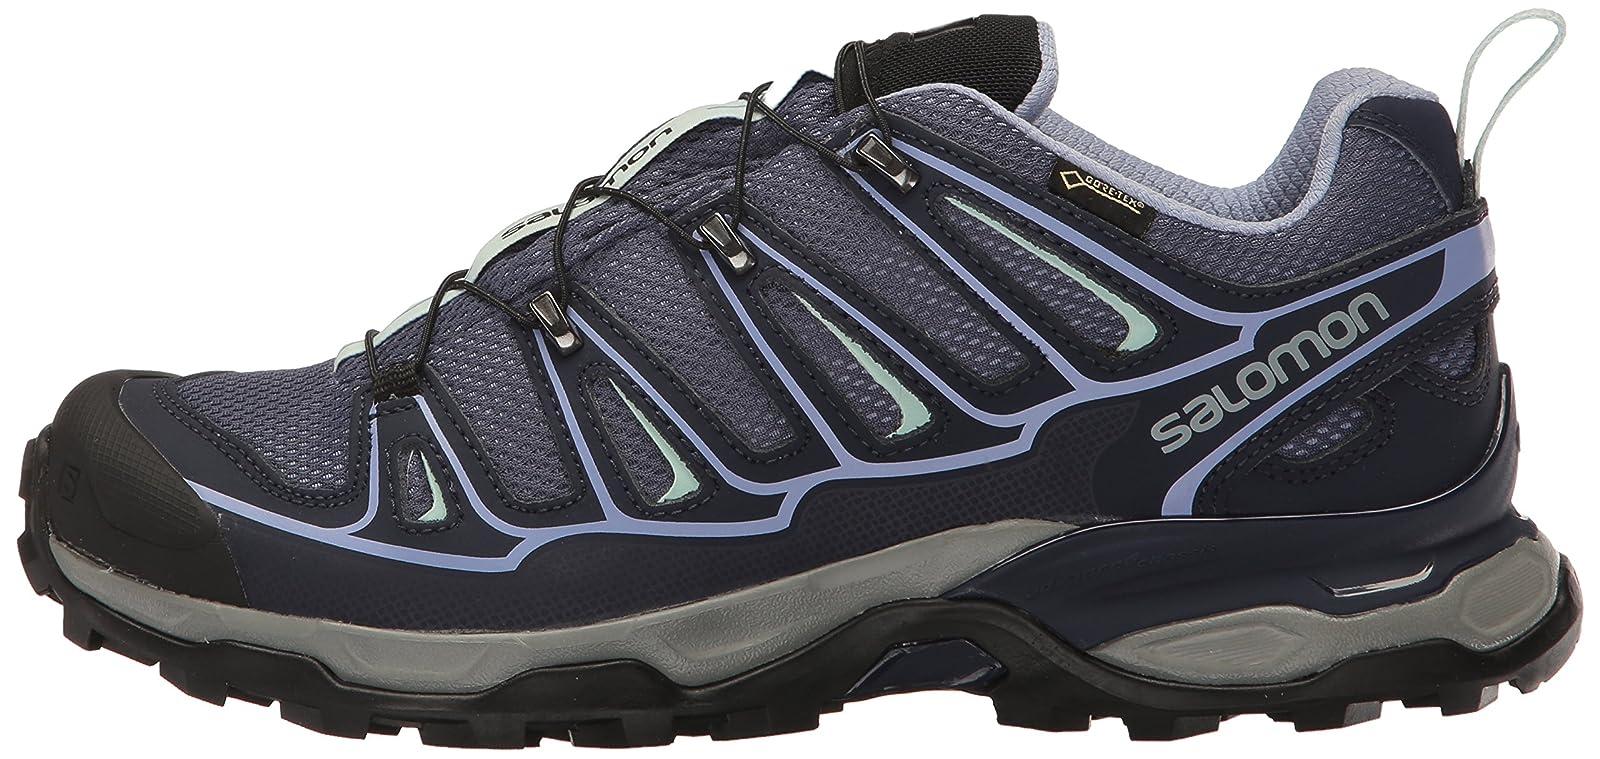 Salomon Women's X Ultra 2 GTX W Hiking Shoe 7 M US - 5